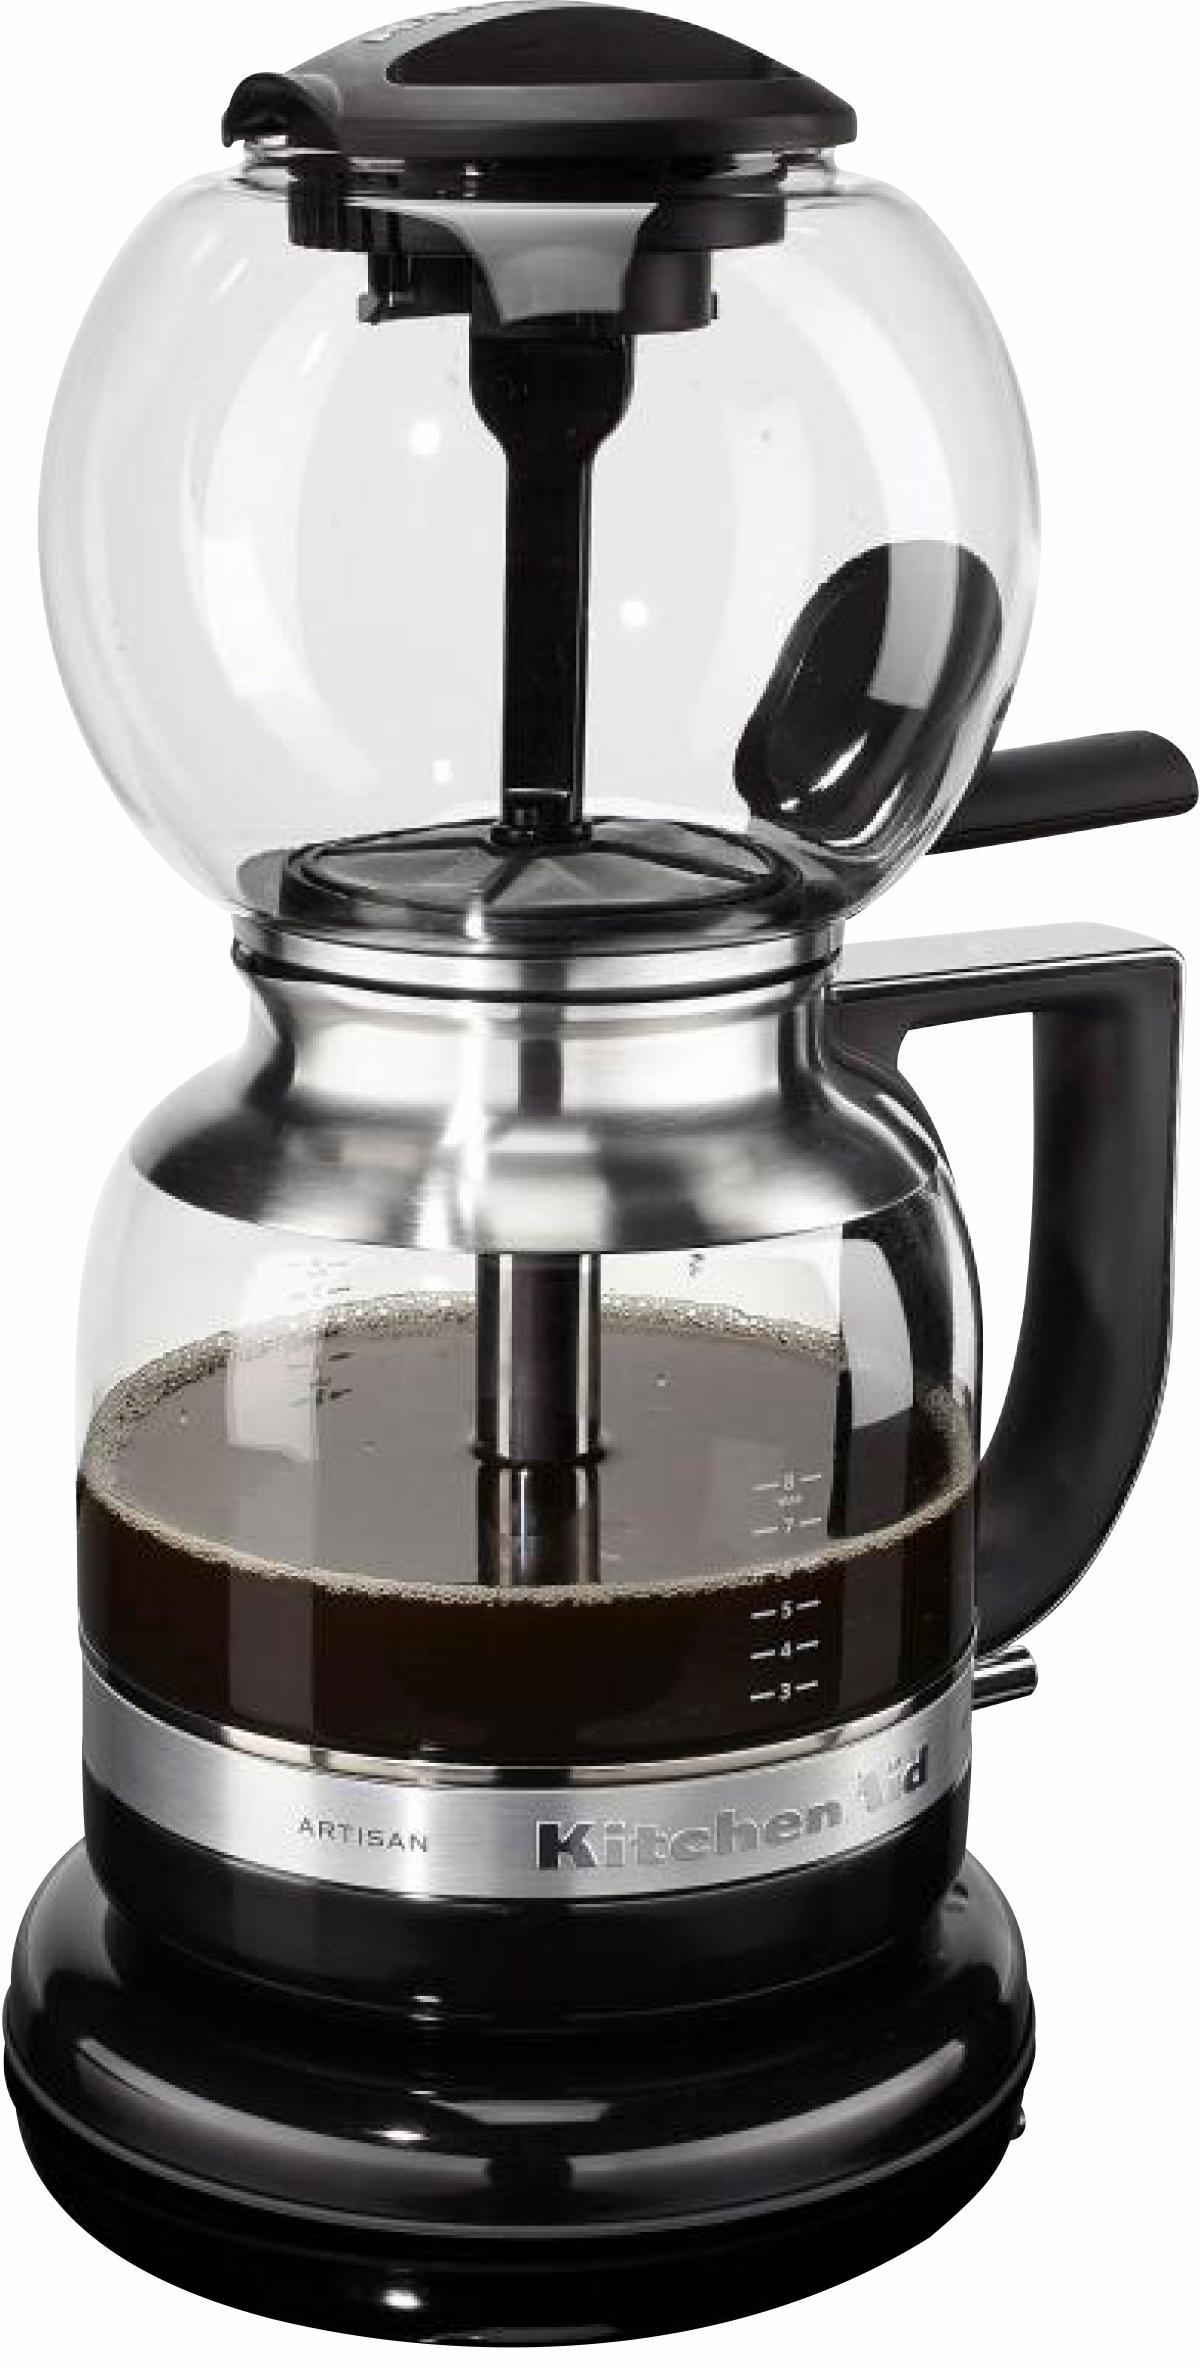 KitchenAid ® Artisan sifon-koffiezetapparaat 5KCM0812, onyx zwart veilig op otto.nl kopen